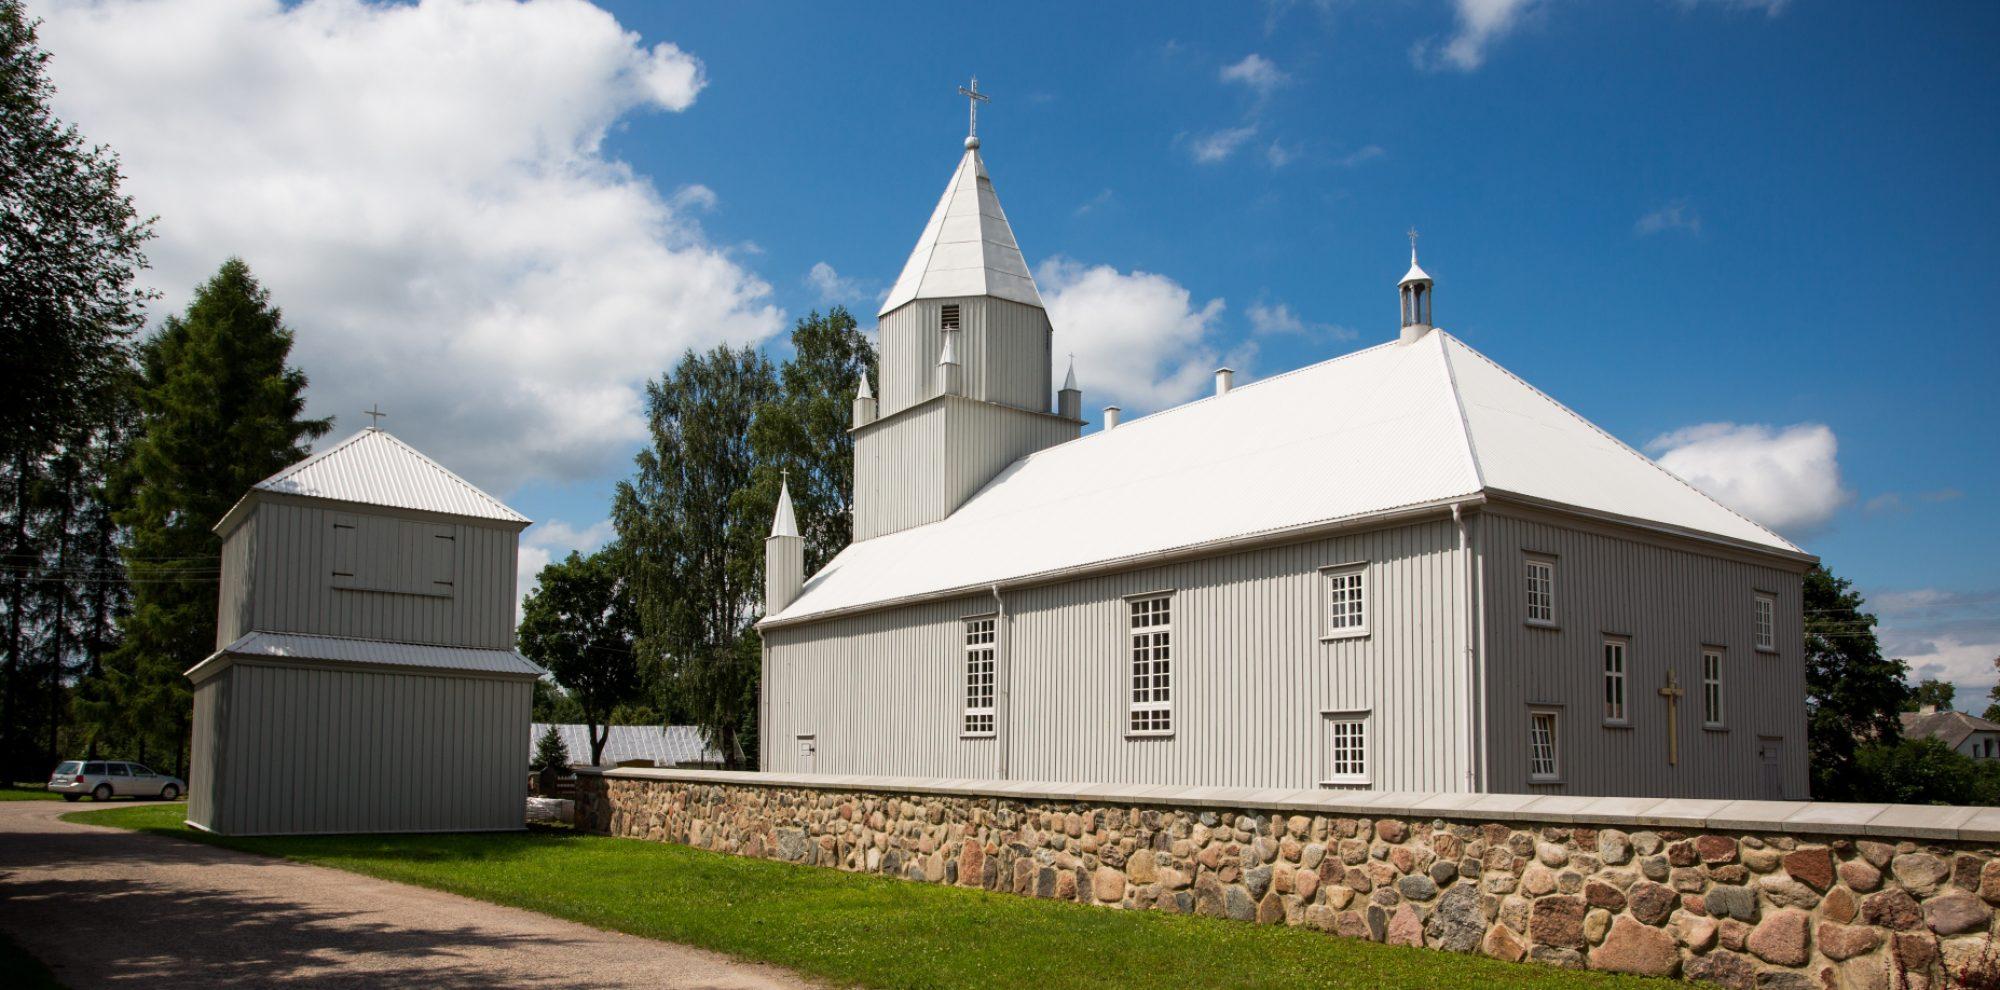 Kaimelio šv. Arkangelo Mykolo bažnyčia